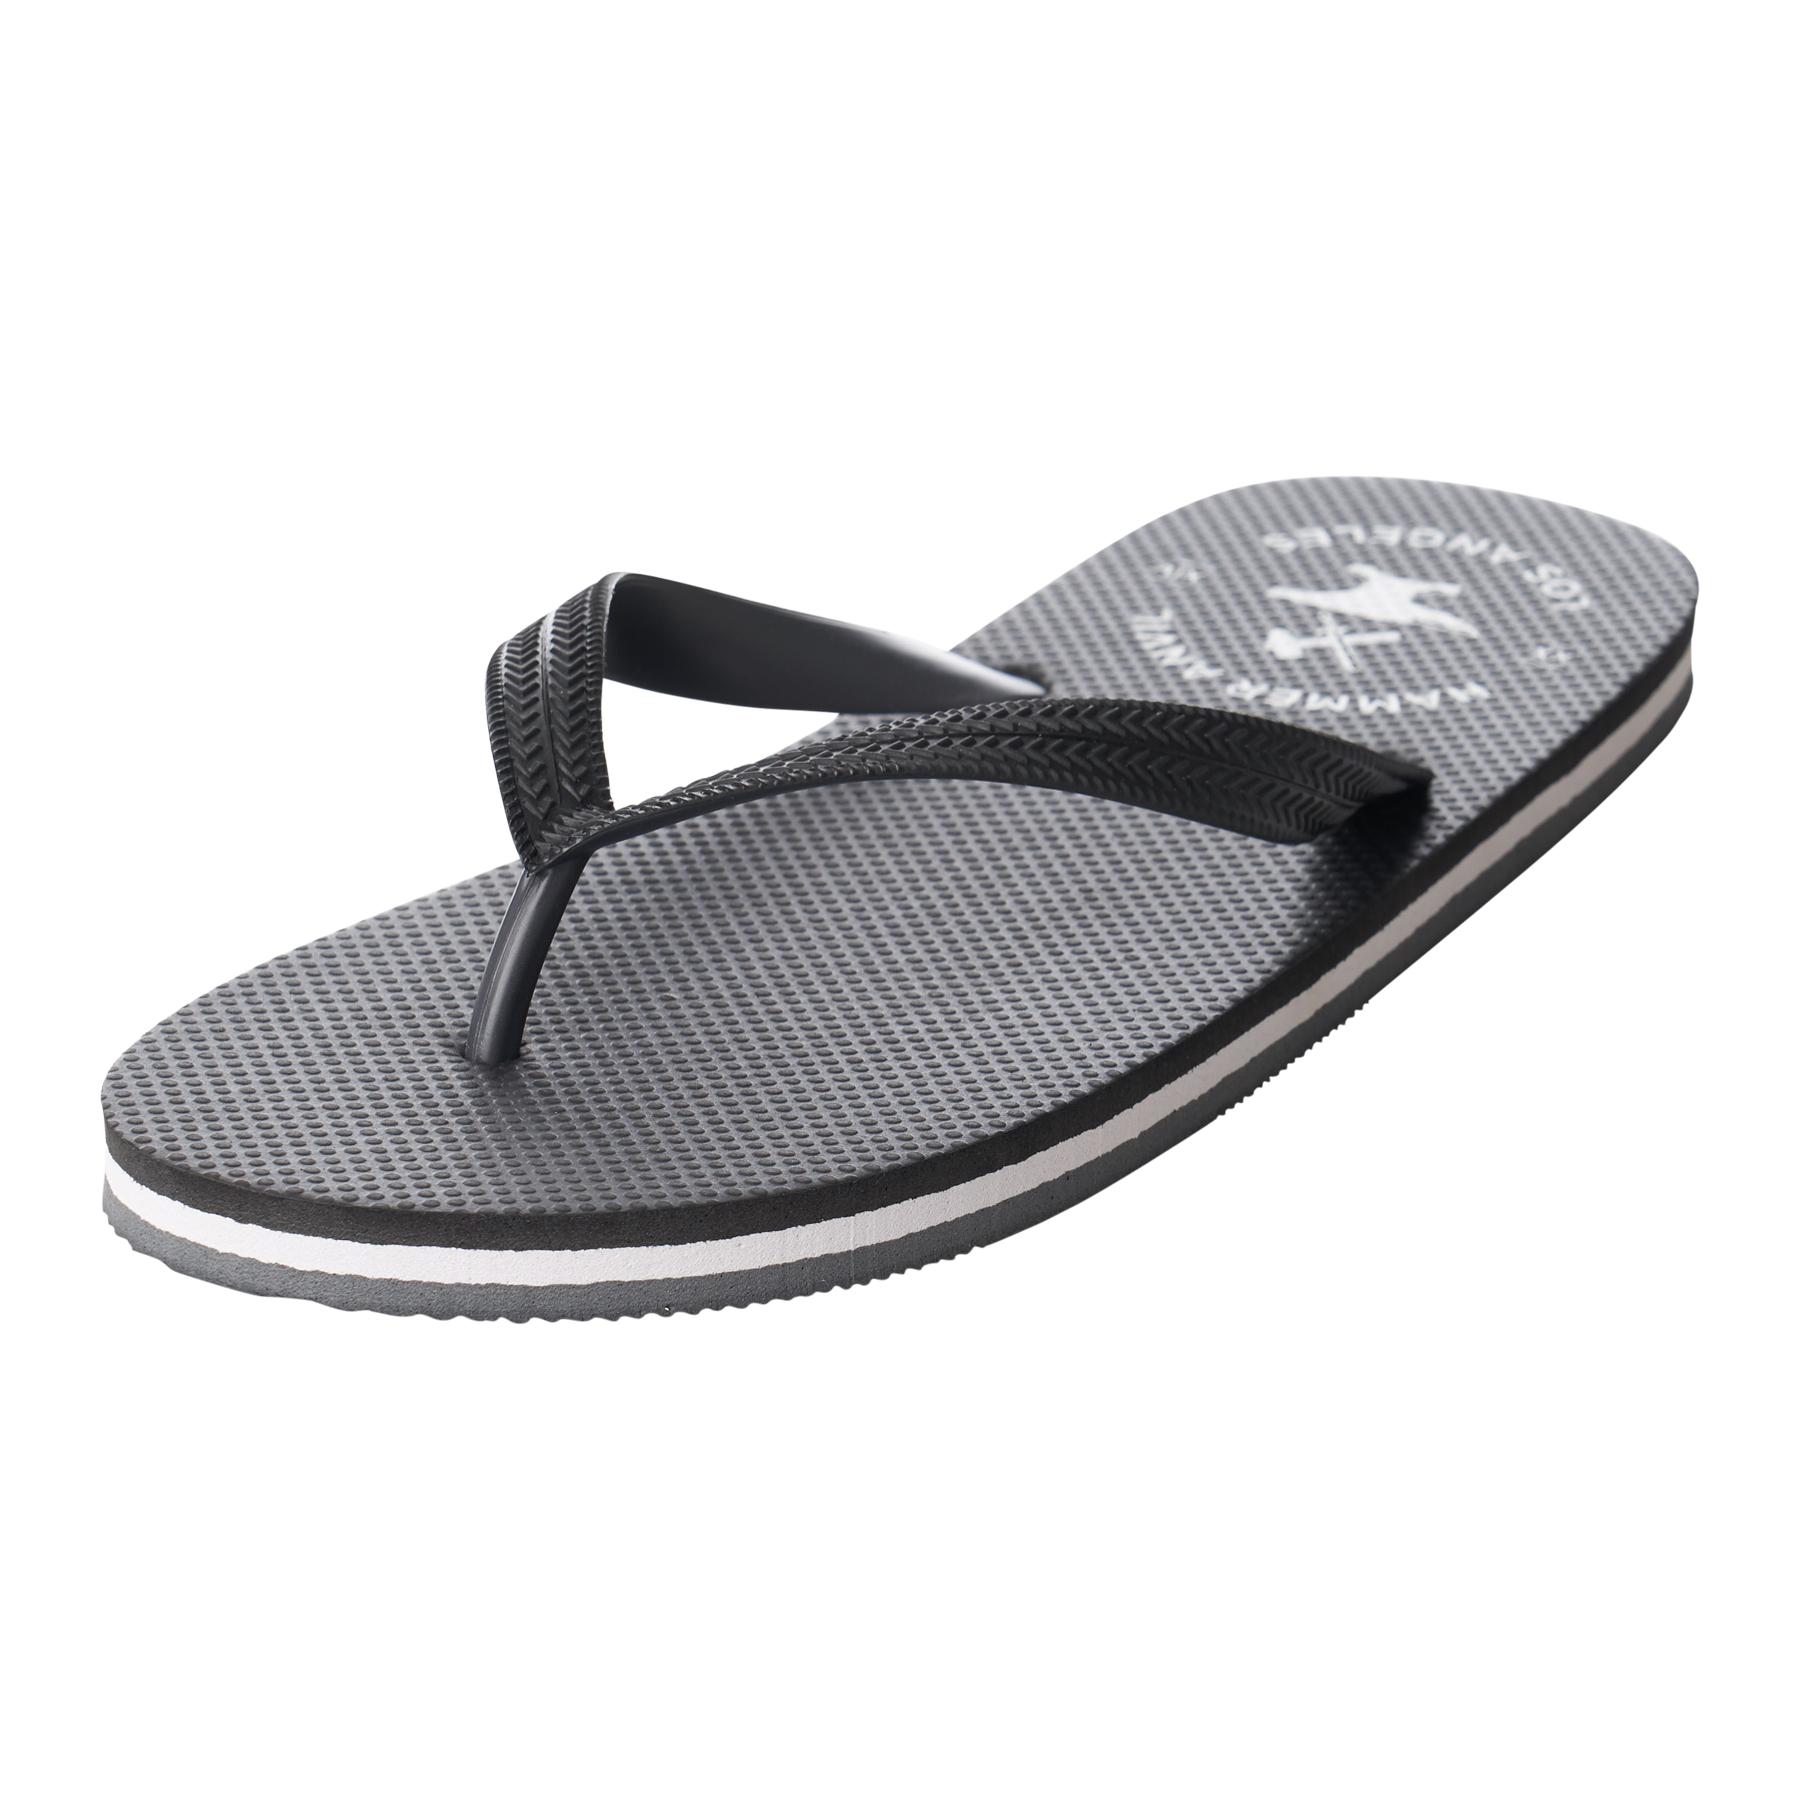 Hammer-Anvil-Mens-Flip-Flops-Casual-Thong-Summer-Sandals-Comfortable-Beach-Shoes thumbnail 16